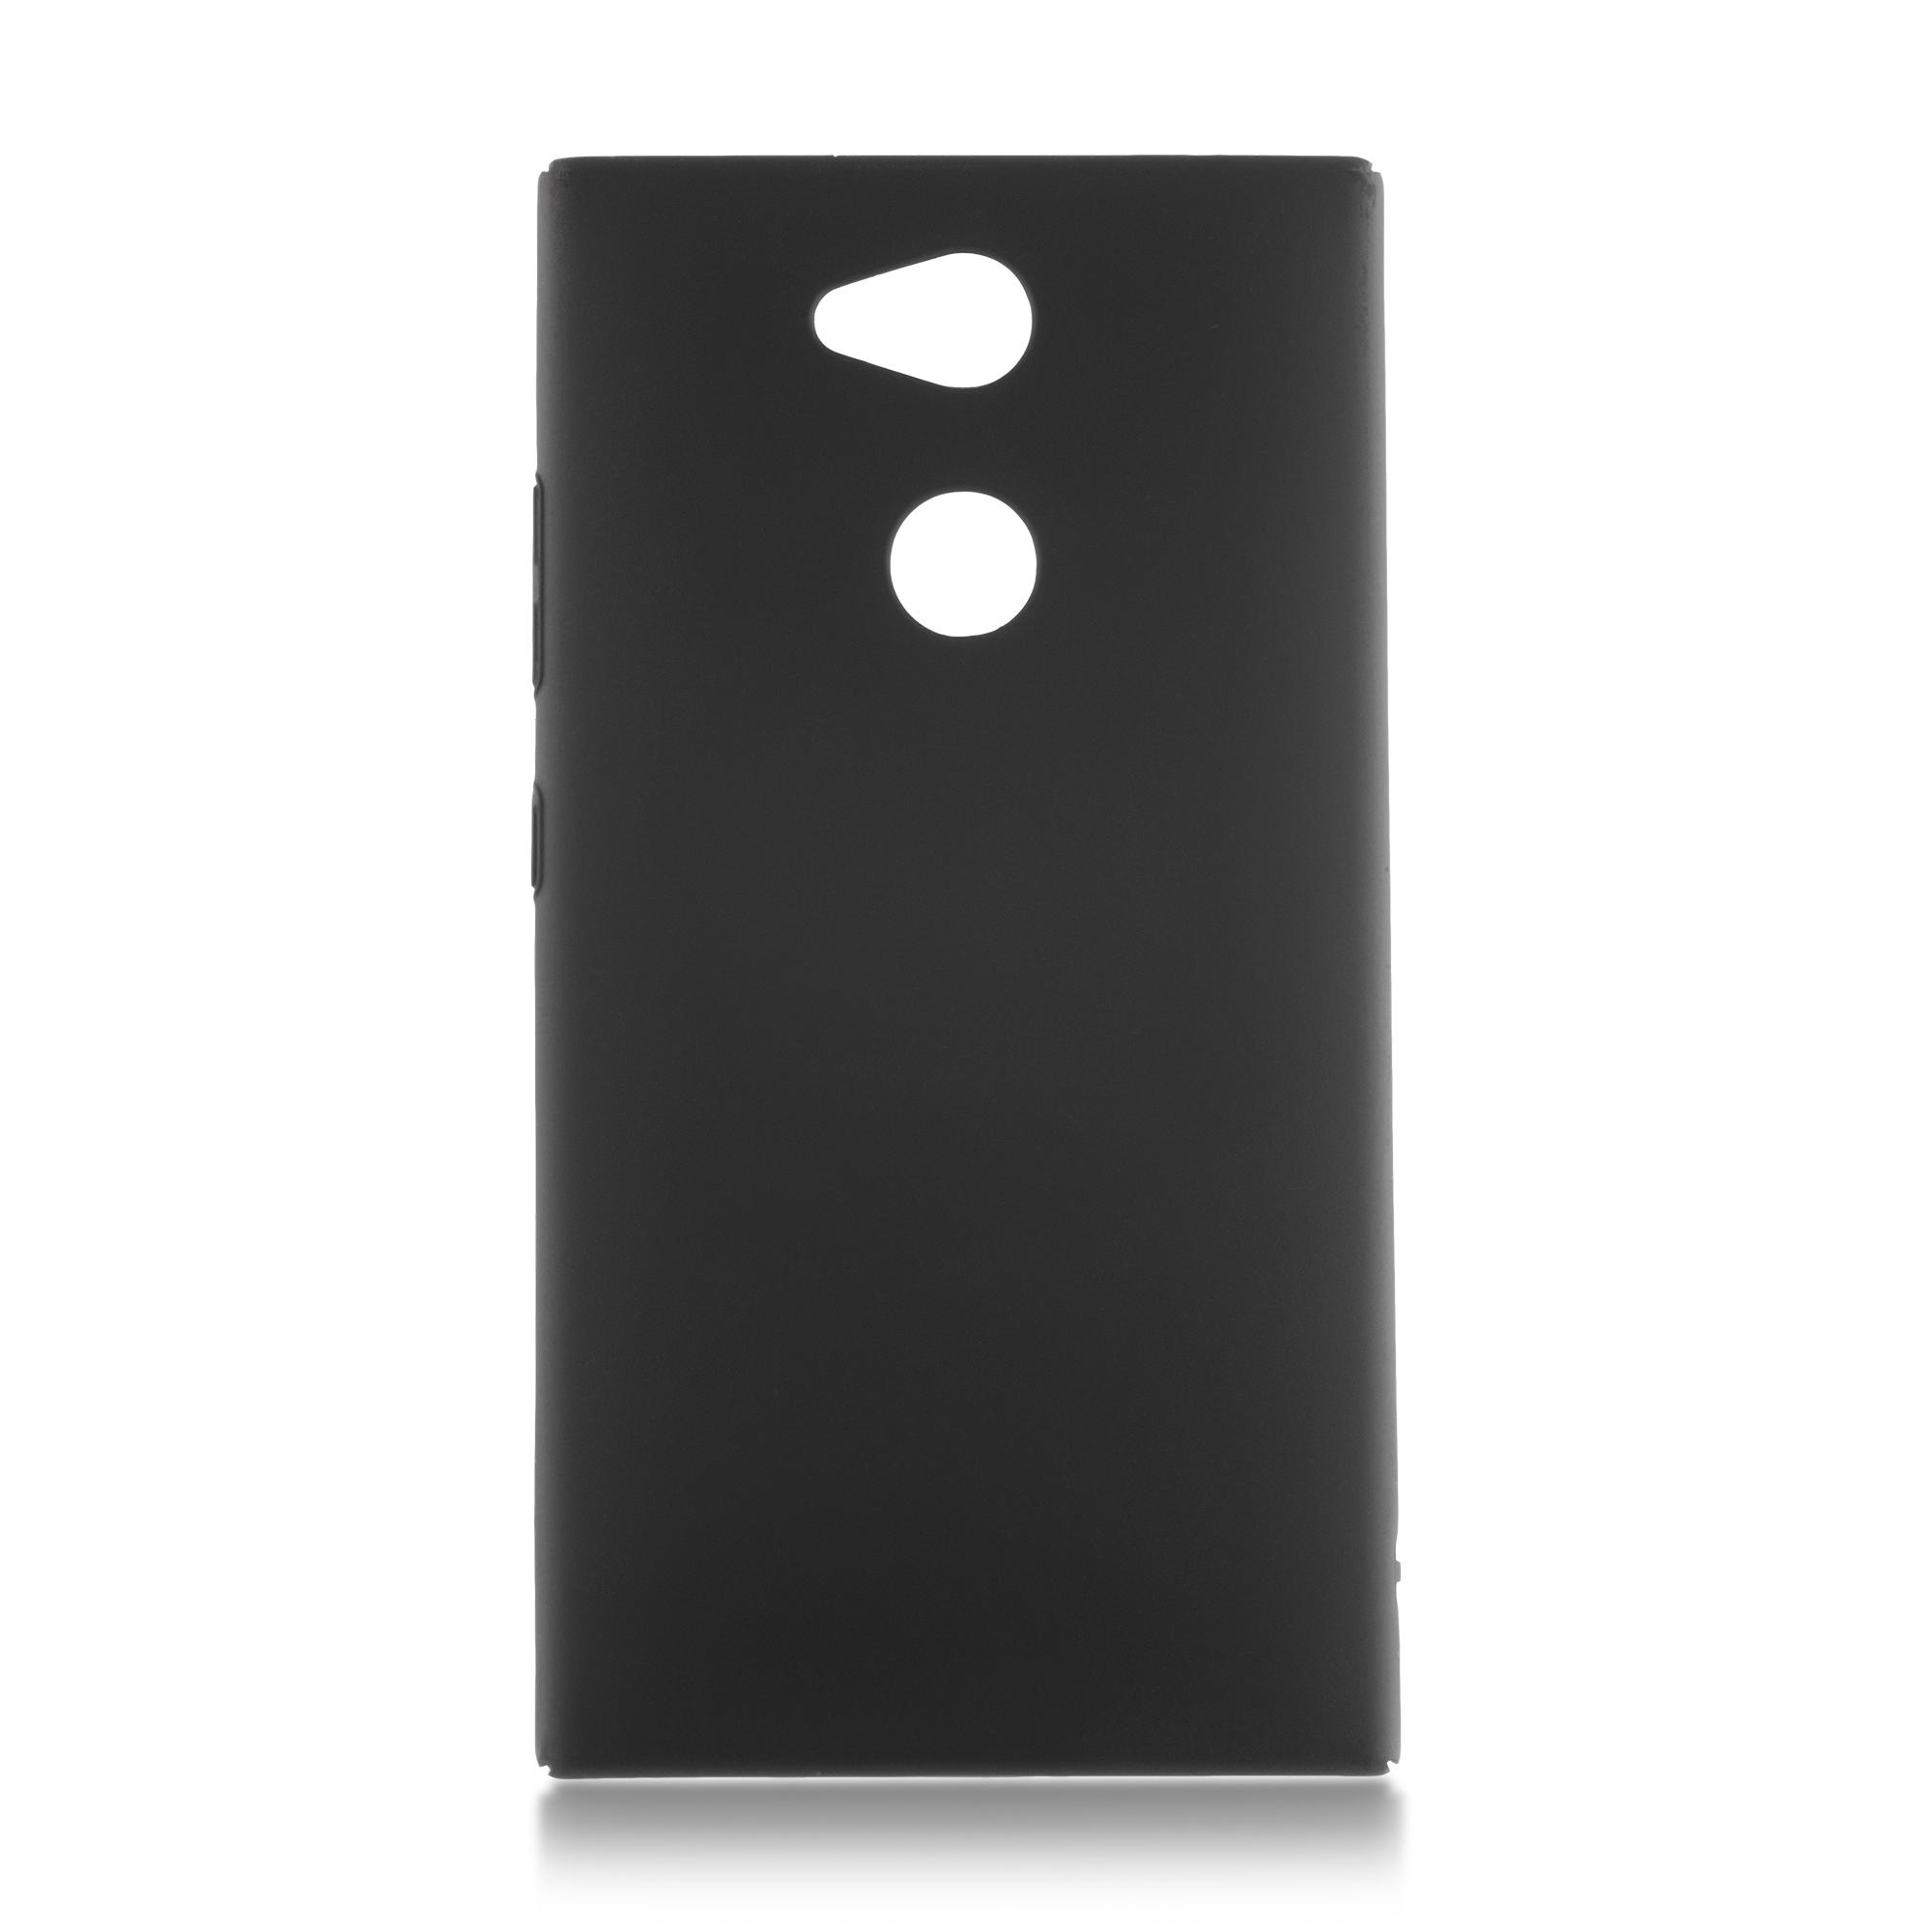 Накладка Brosco Soft-touch для Sony Xperia L2, черная